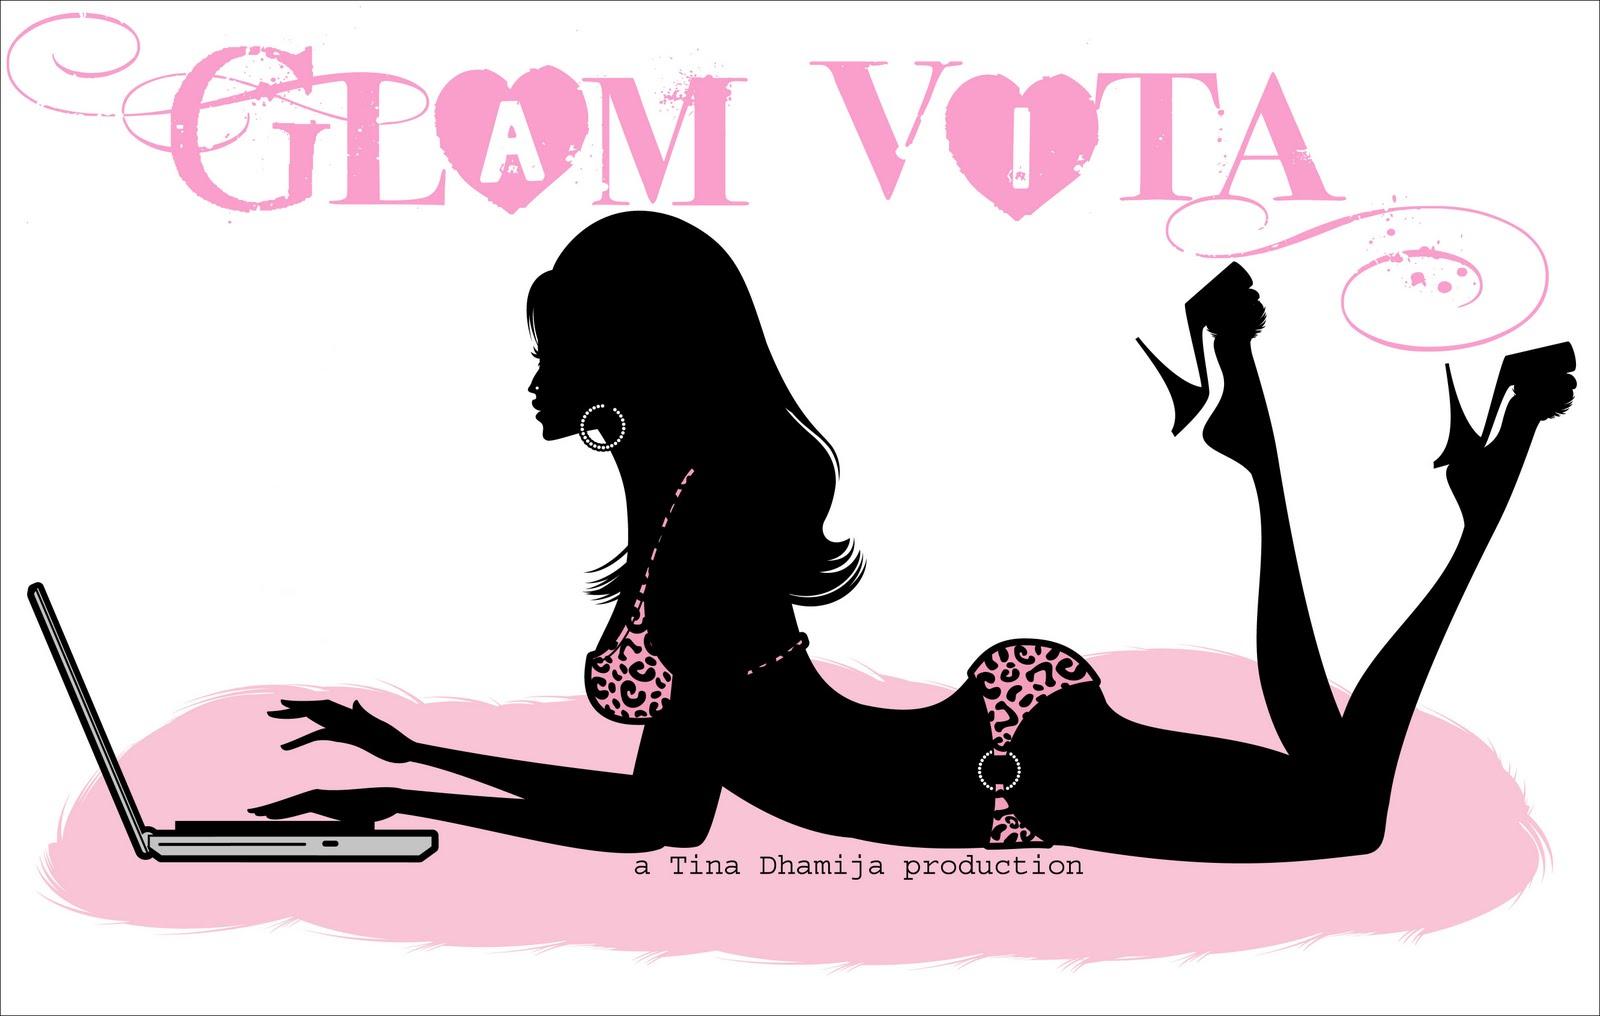 Glam Vita